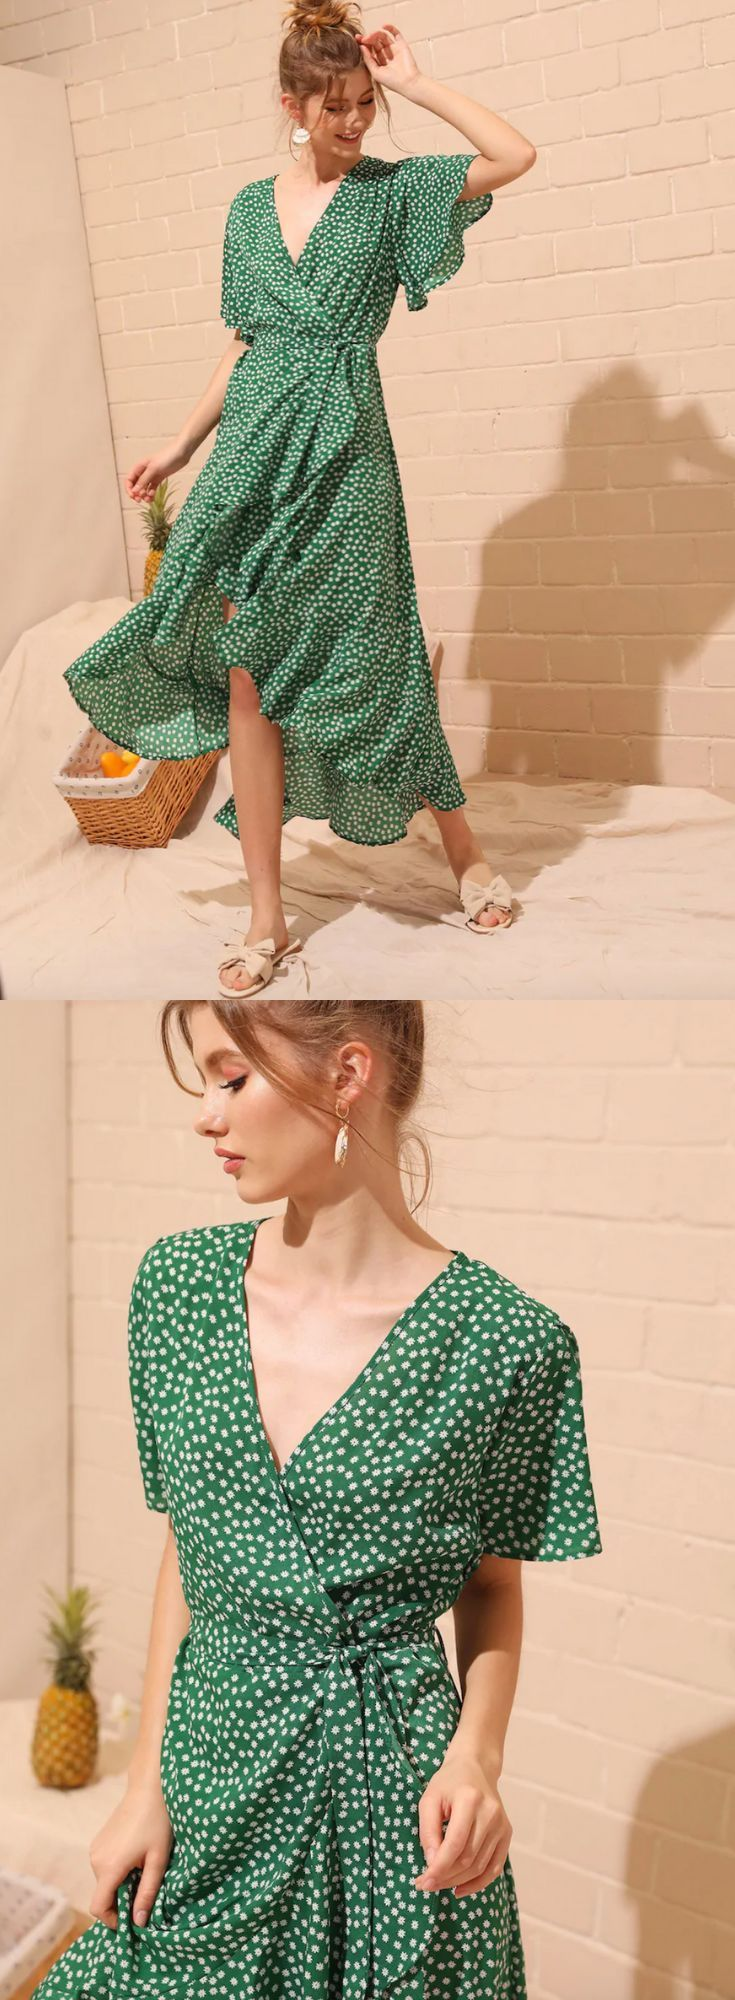 Green Ditsy Floral Print Wrap Dress,  #Ditsy #Dress #Floral #Green #Honeymoonclothes #Print #…